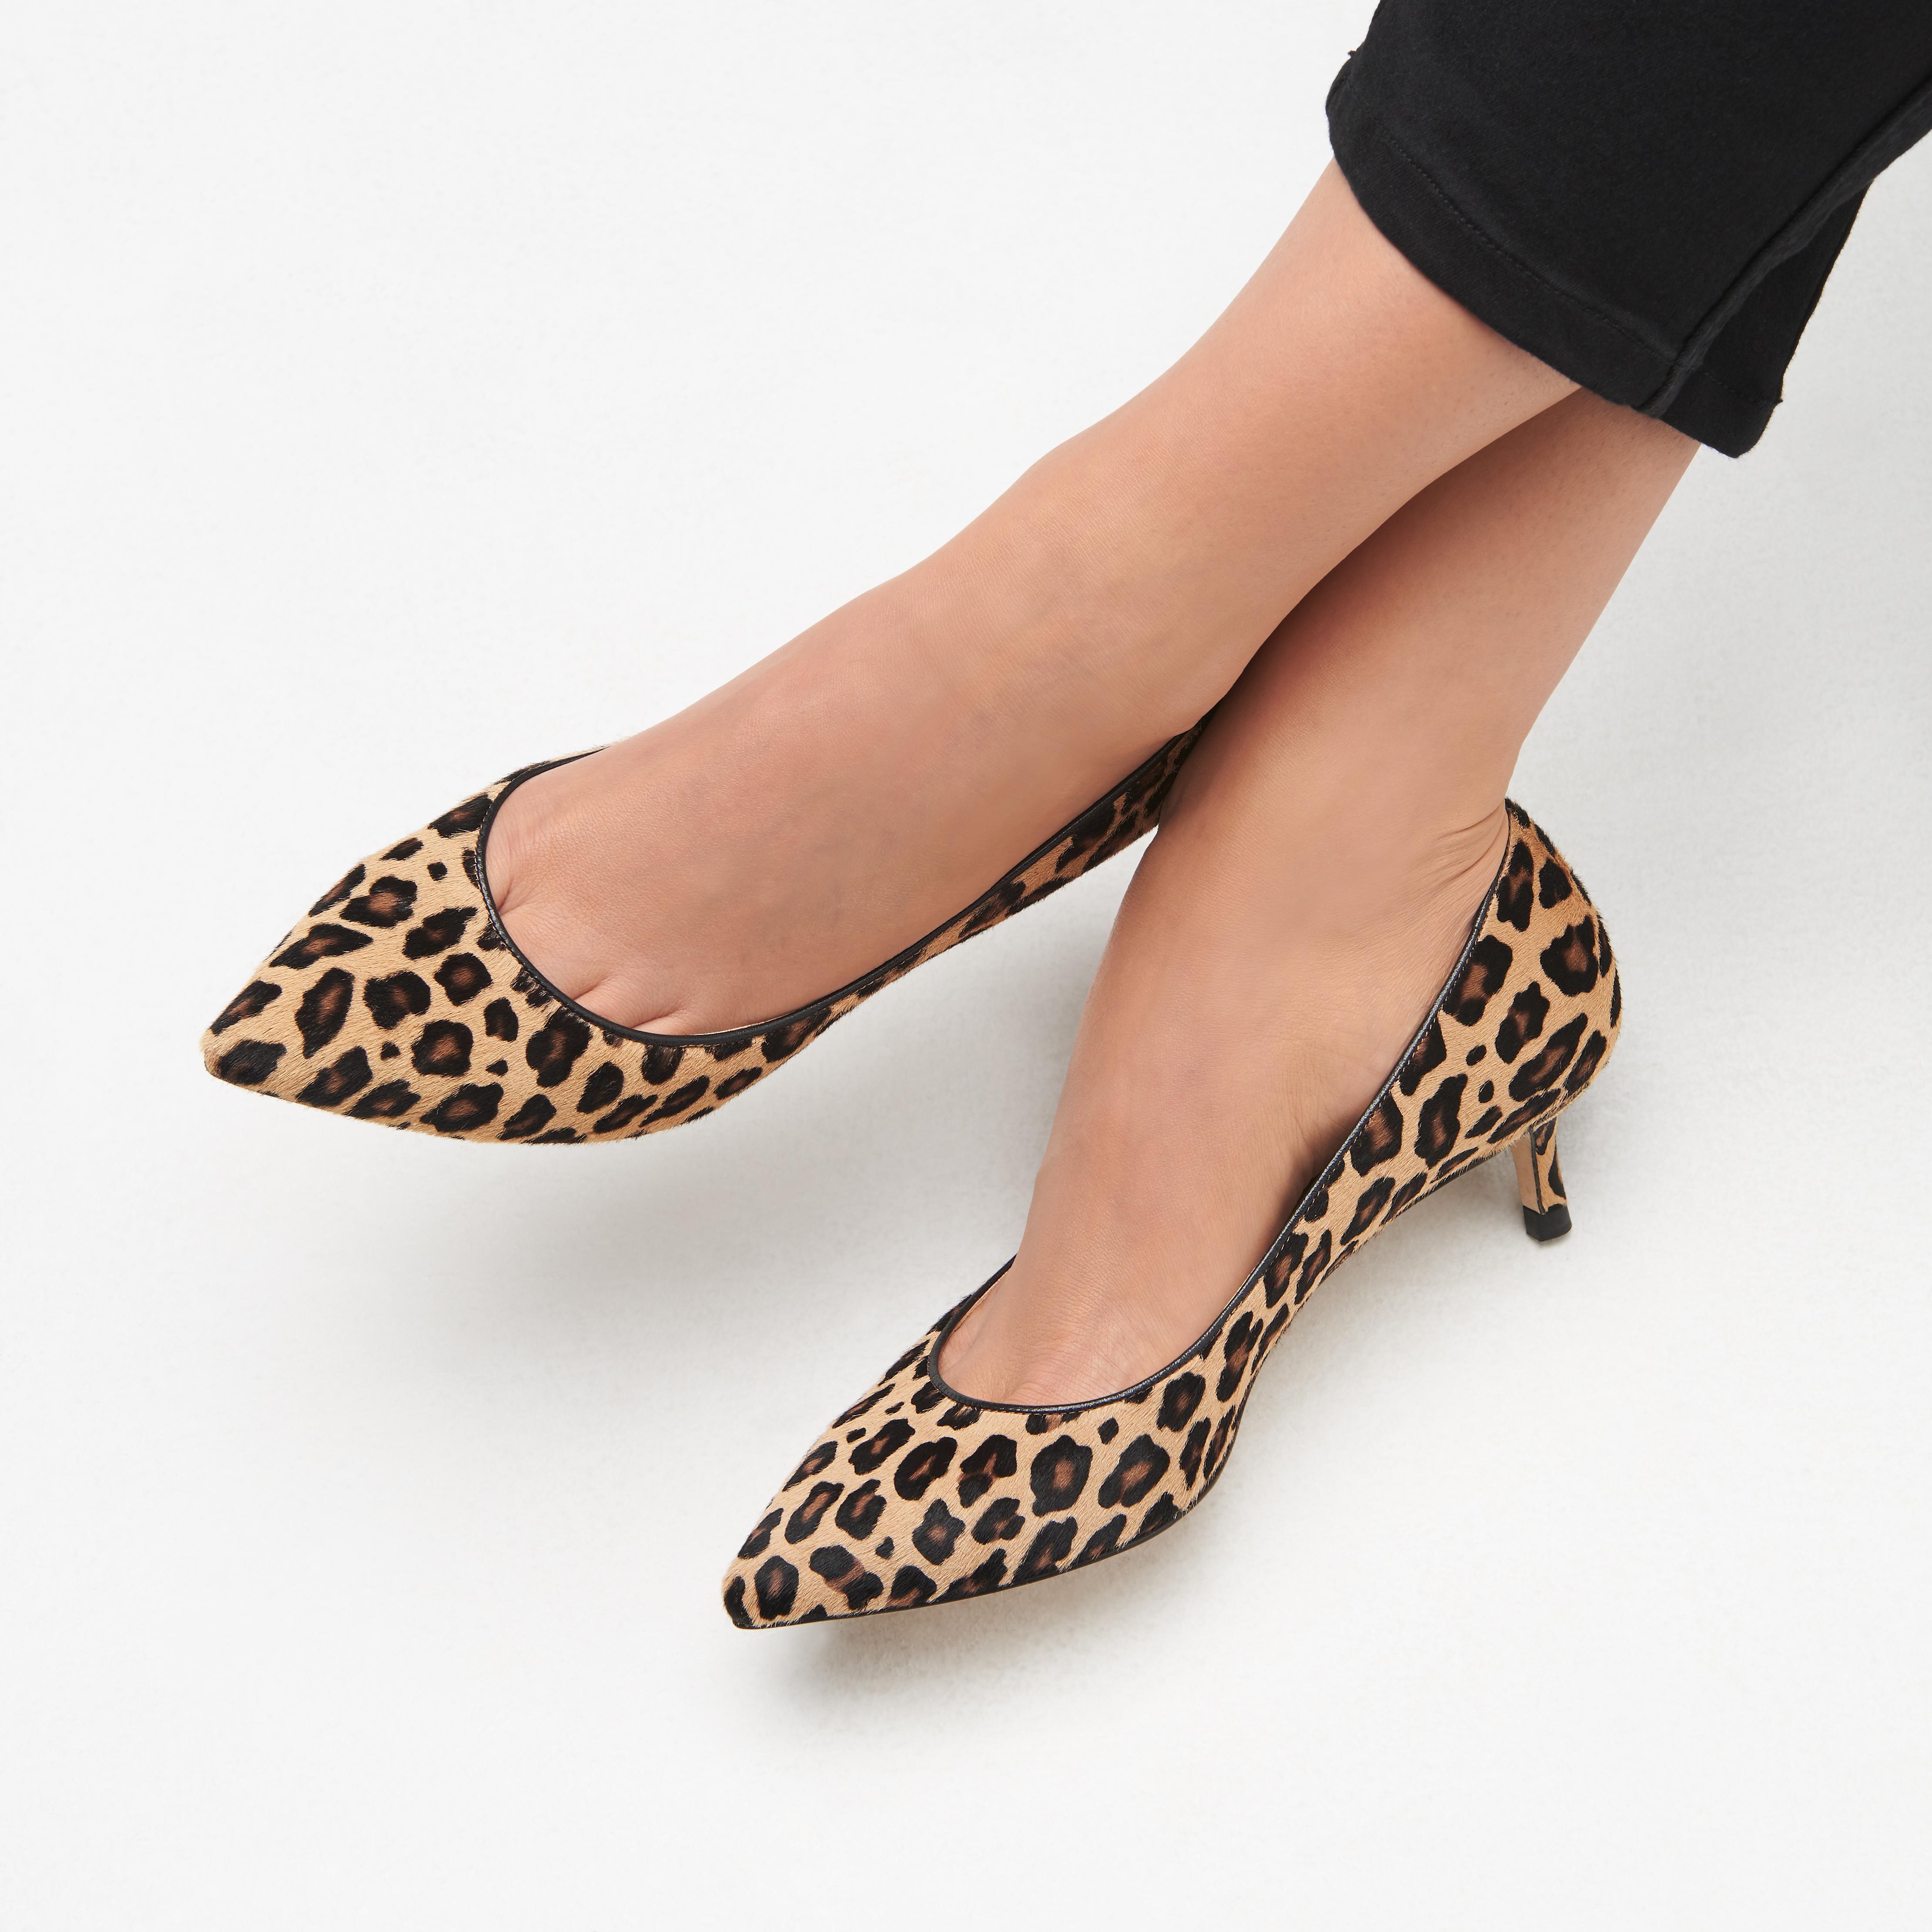 Audrey Leopard Print Heels Kitten Heels Shoes Collections L K Bennett London